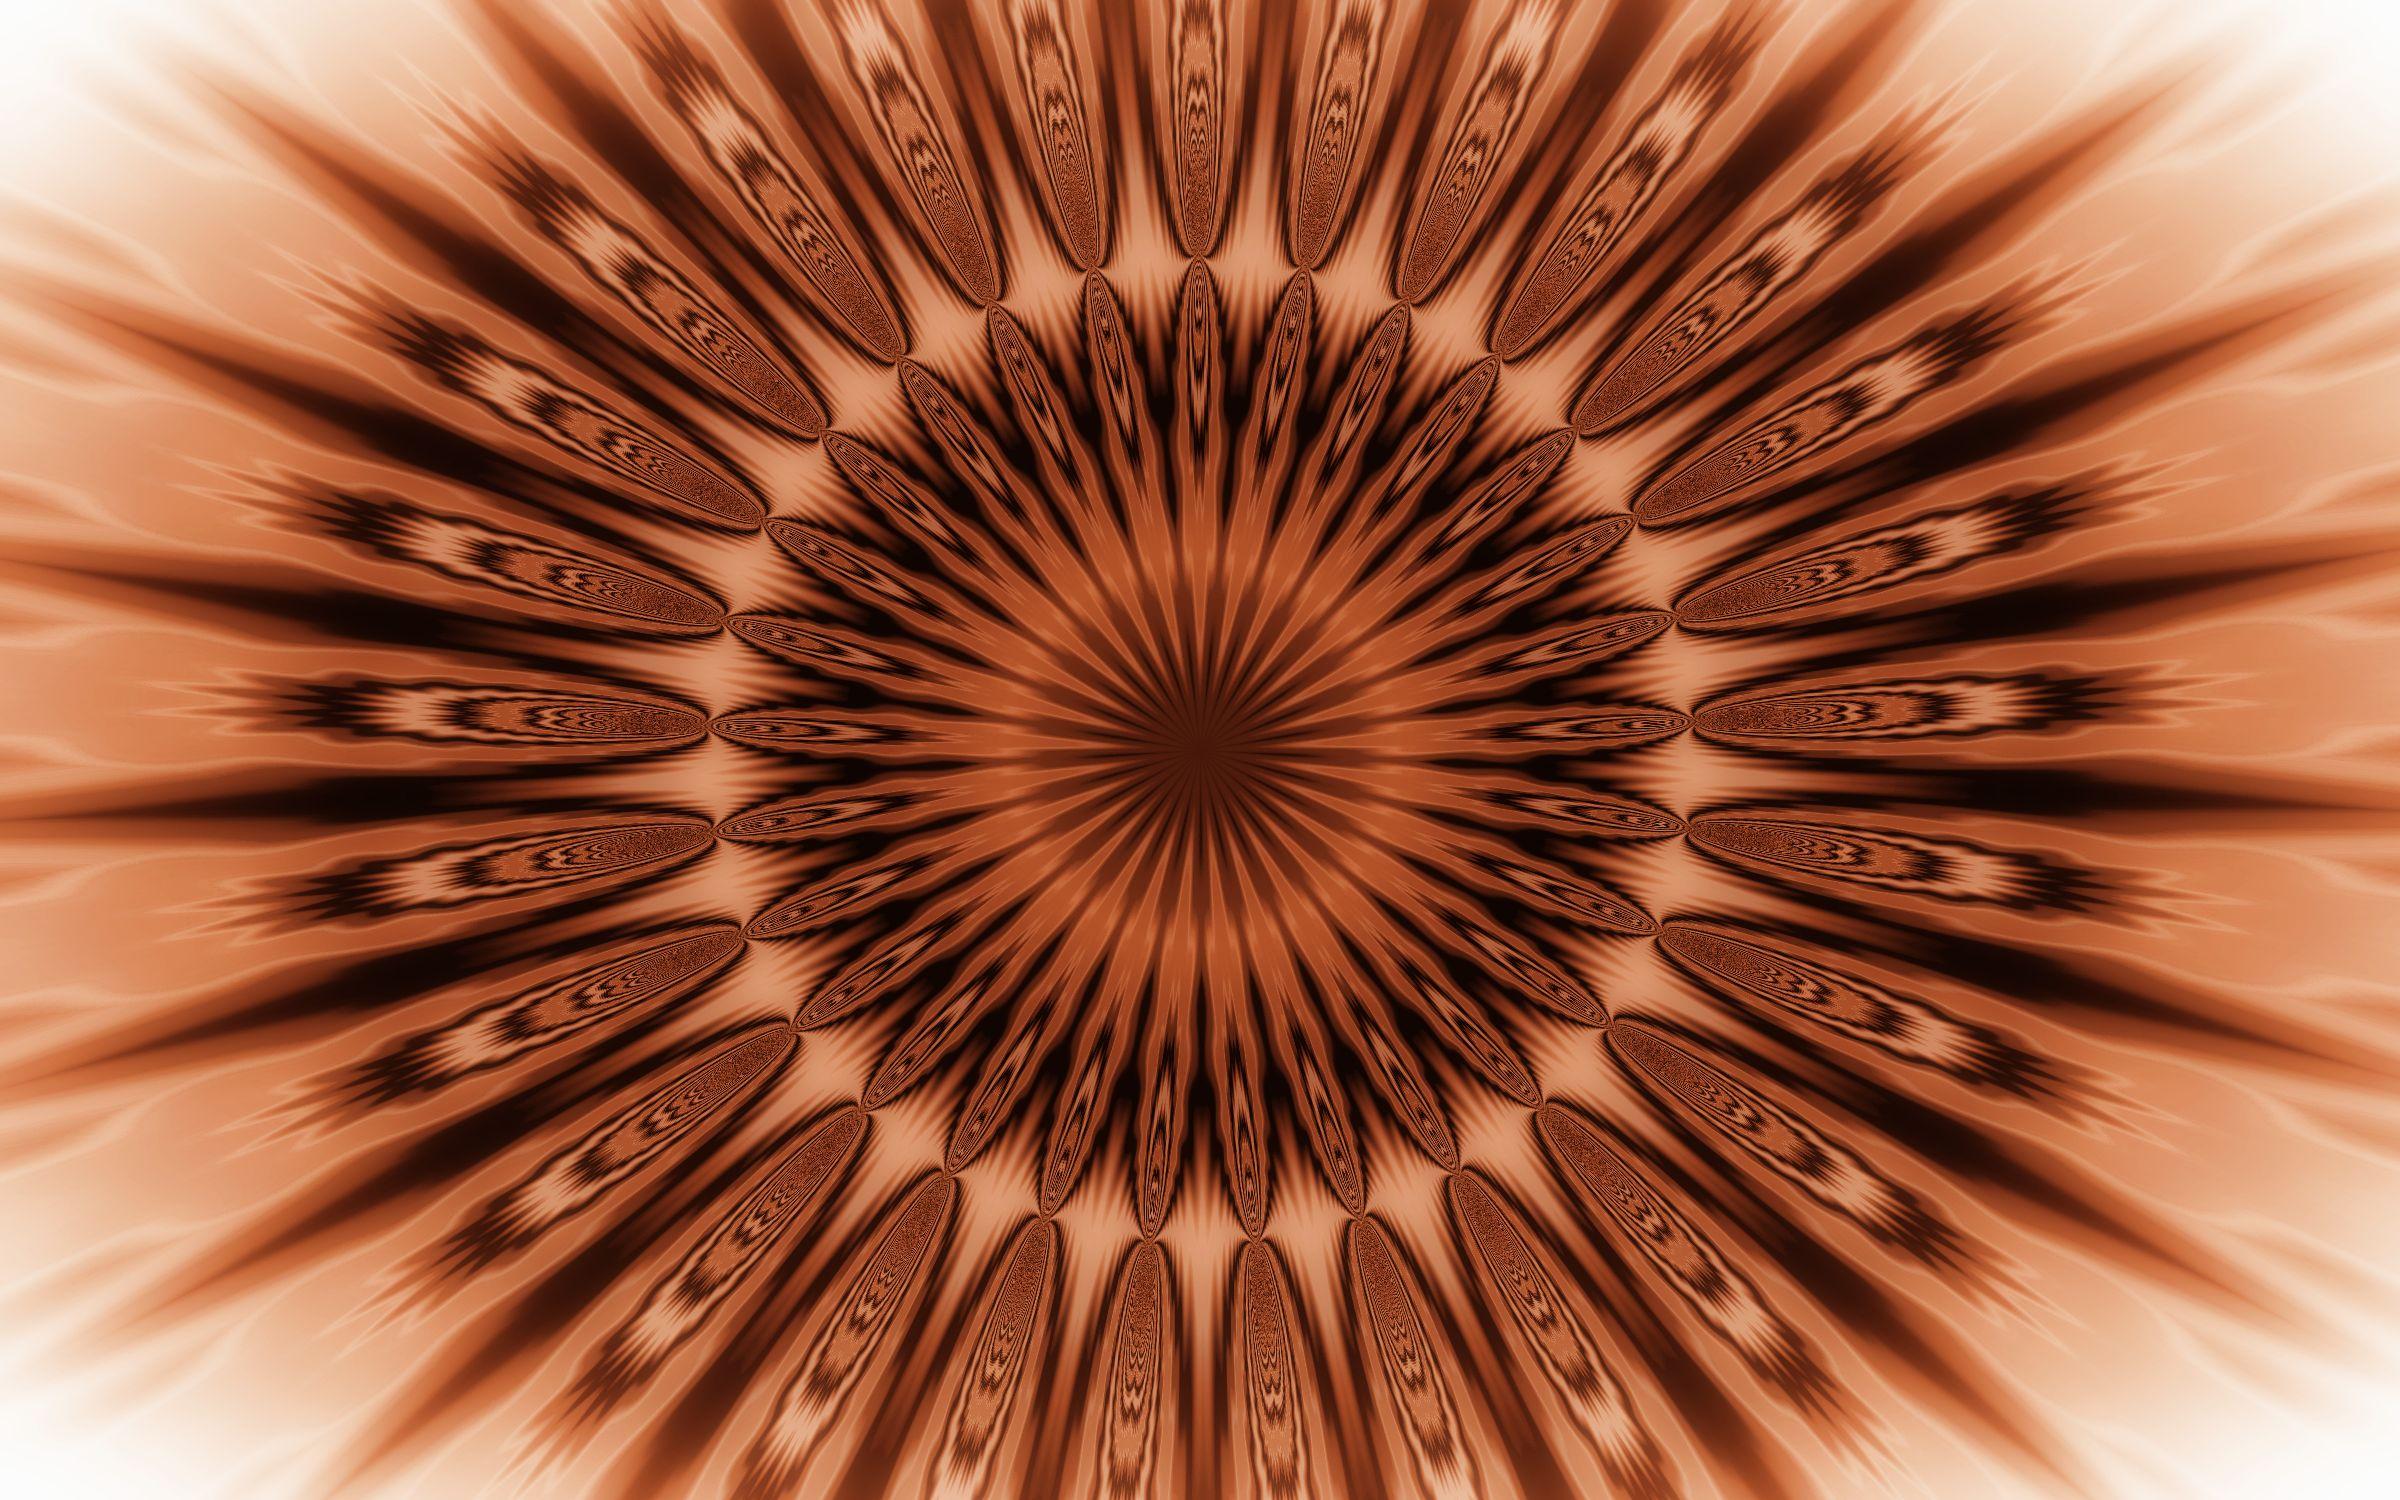 Artistic Brown Digital Art Kaleidoscope Pattern 2400x1500